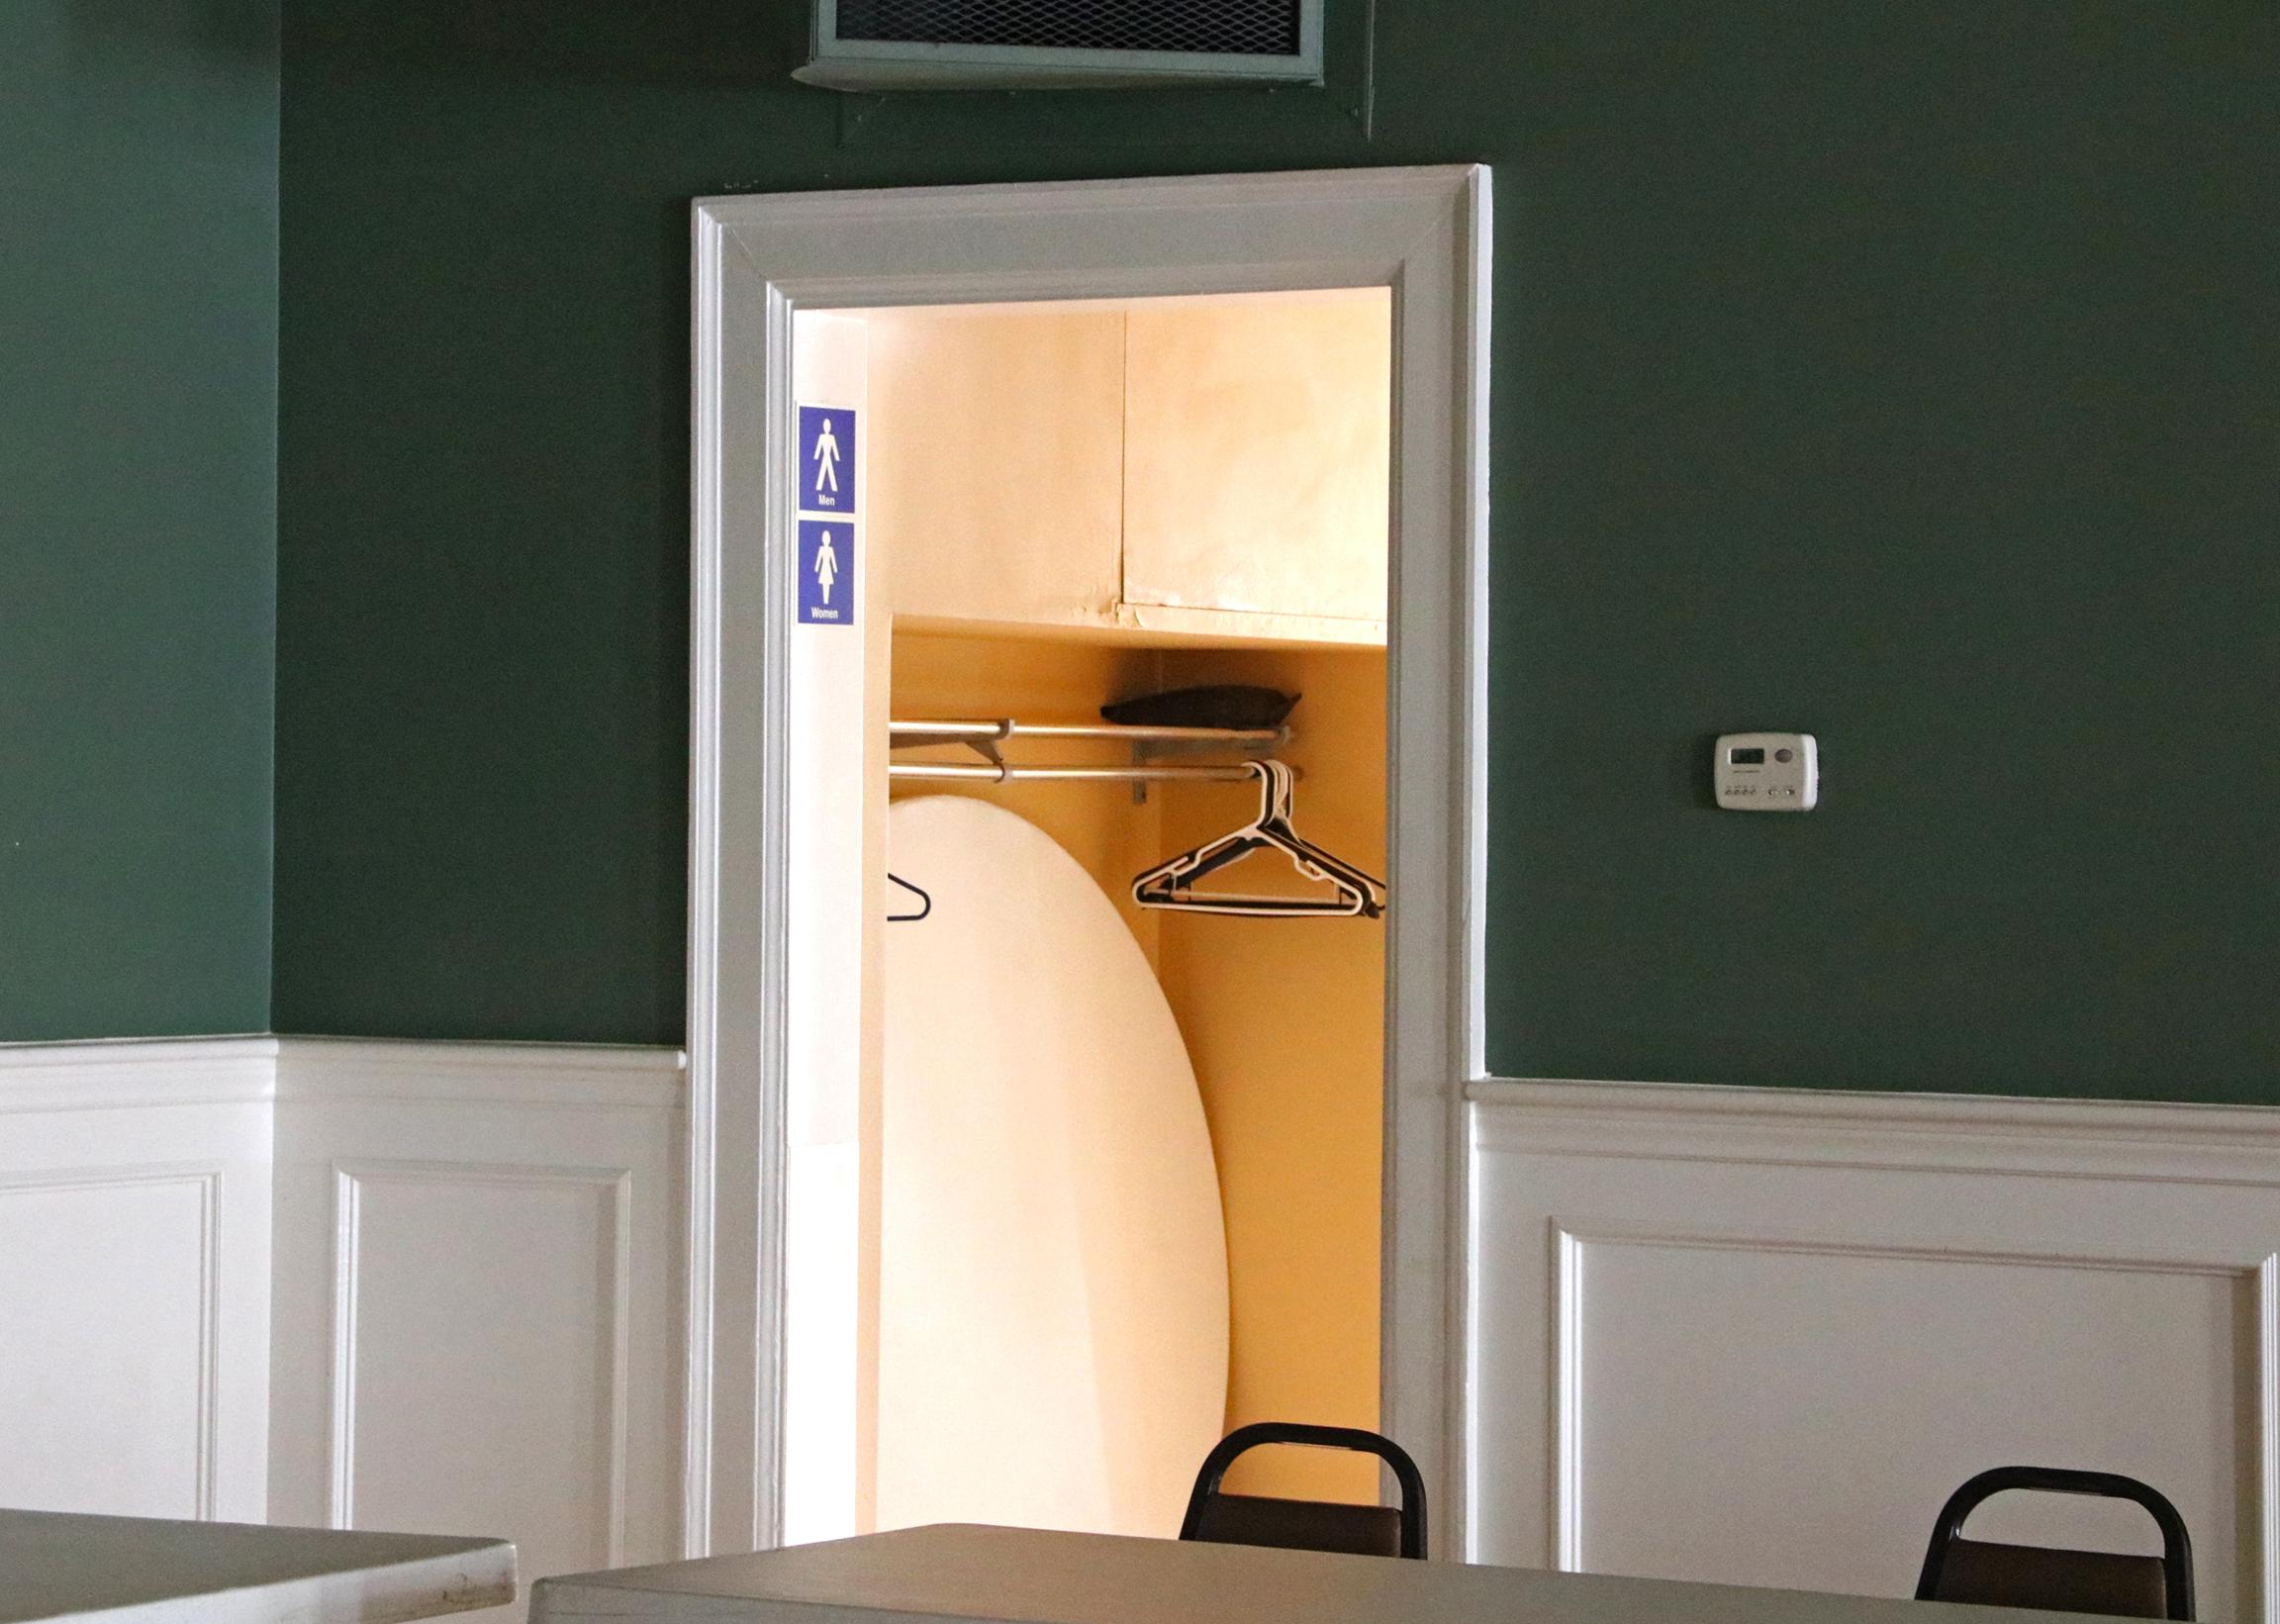 0538_Coat check_rest rooms.jpg